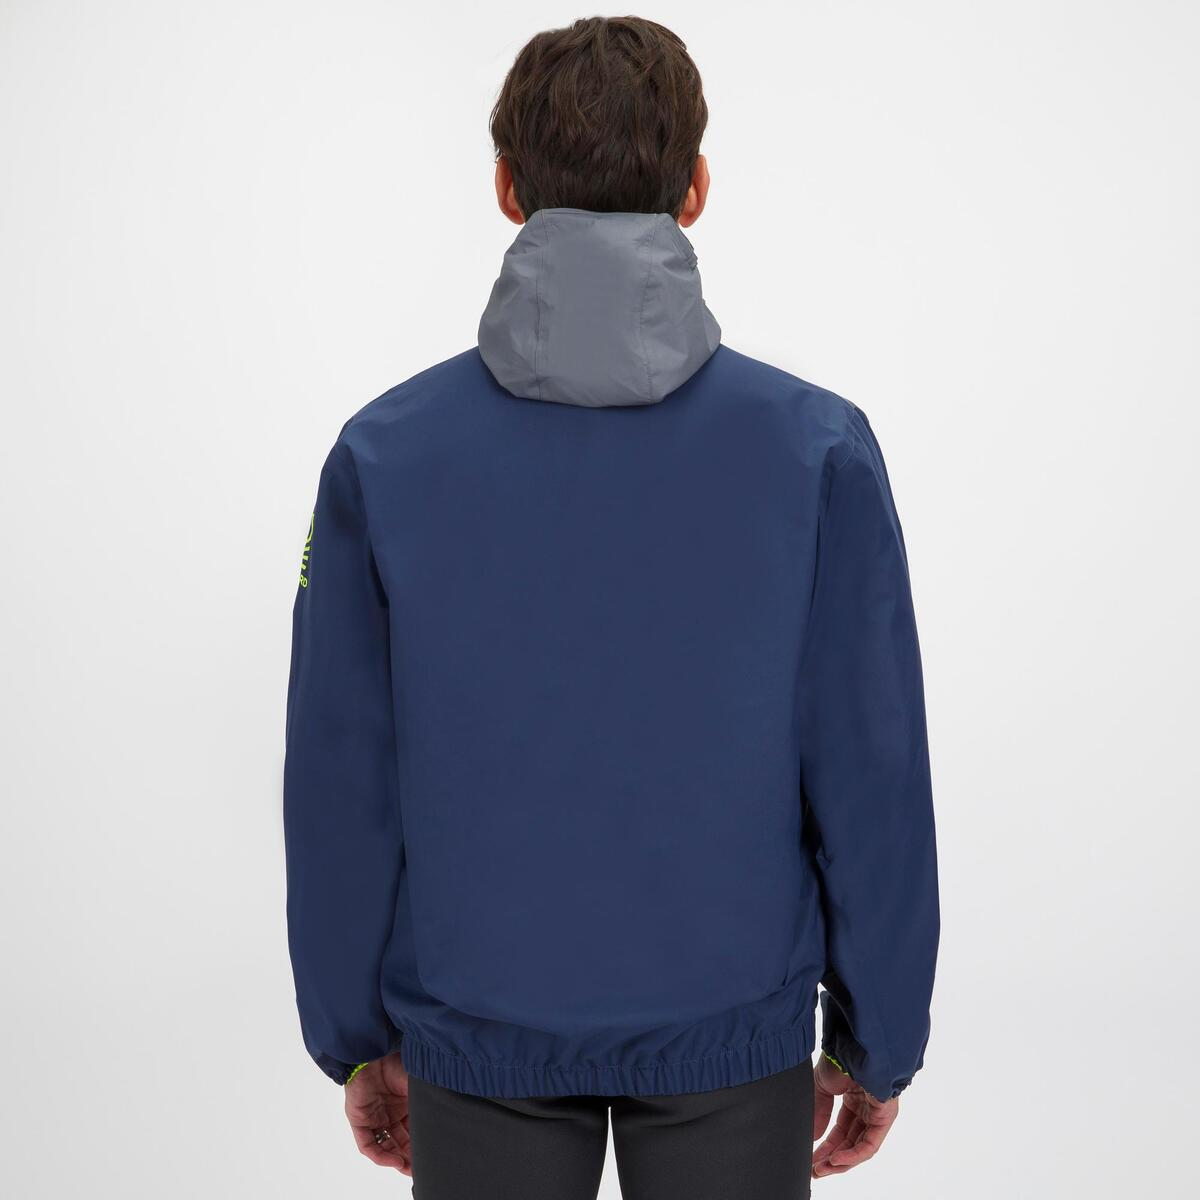 Bild 3 von Segeljacke Dinghy 100 winddicht Erwachsene blau/grau